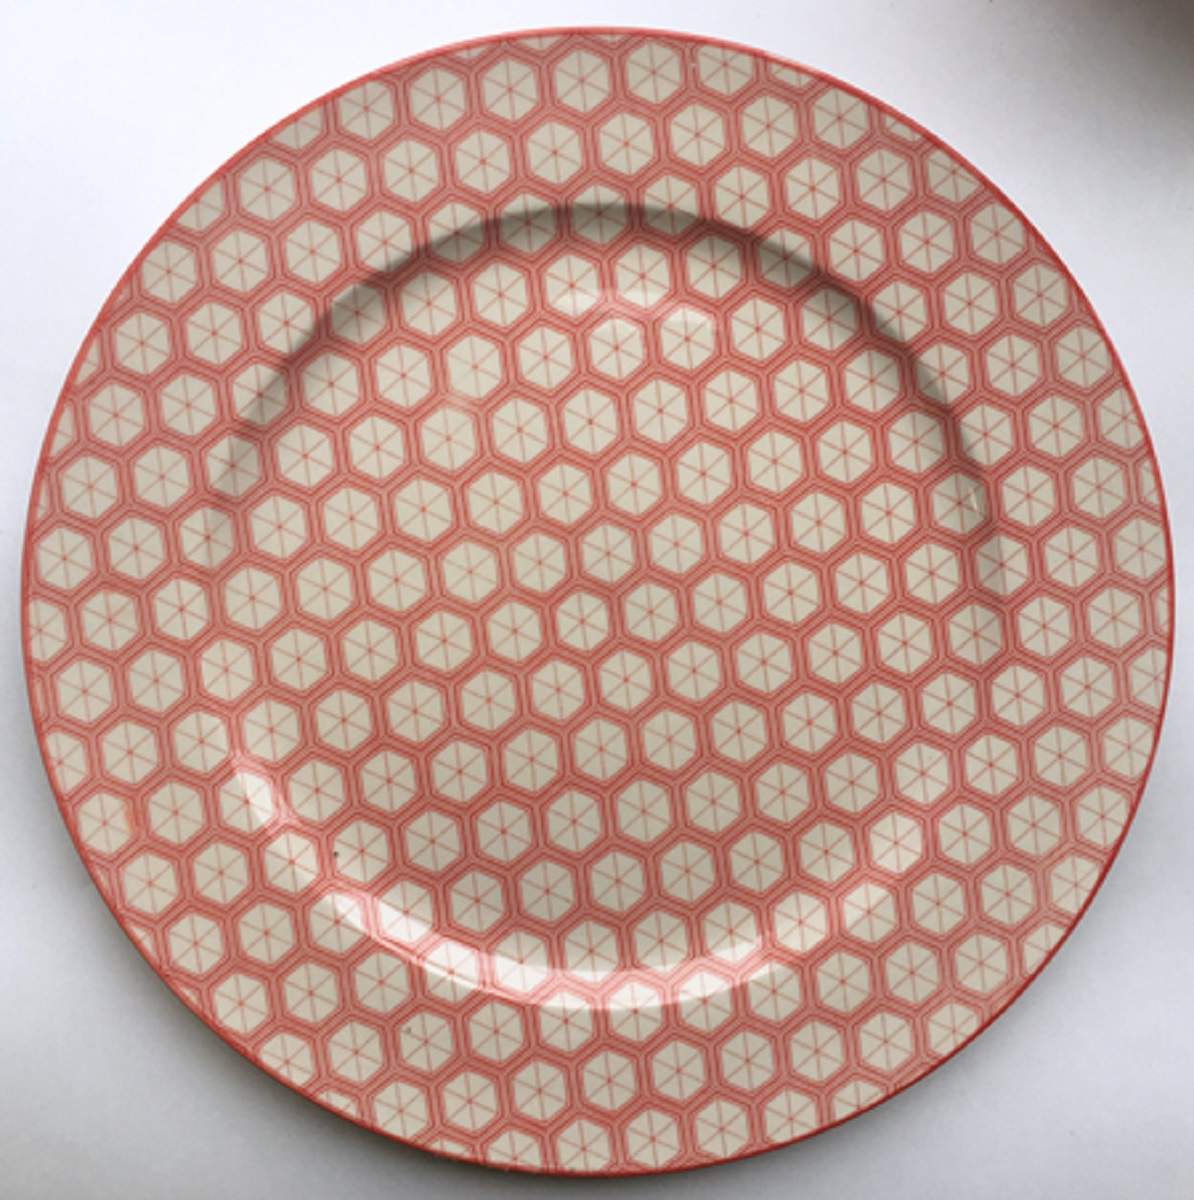 Тарелка обеденная МФК-профит Джуди, диаметр 27 см сувенир мфк профит набор посуды гадкий я 3 пр кружка 210 мл миска 18 см тарелка 19 см в под уп